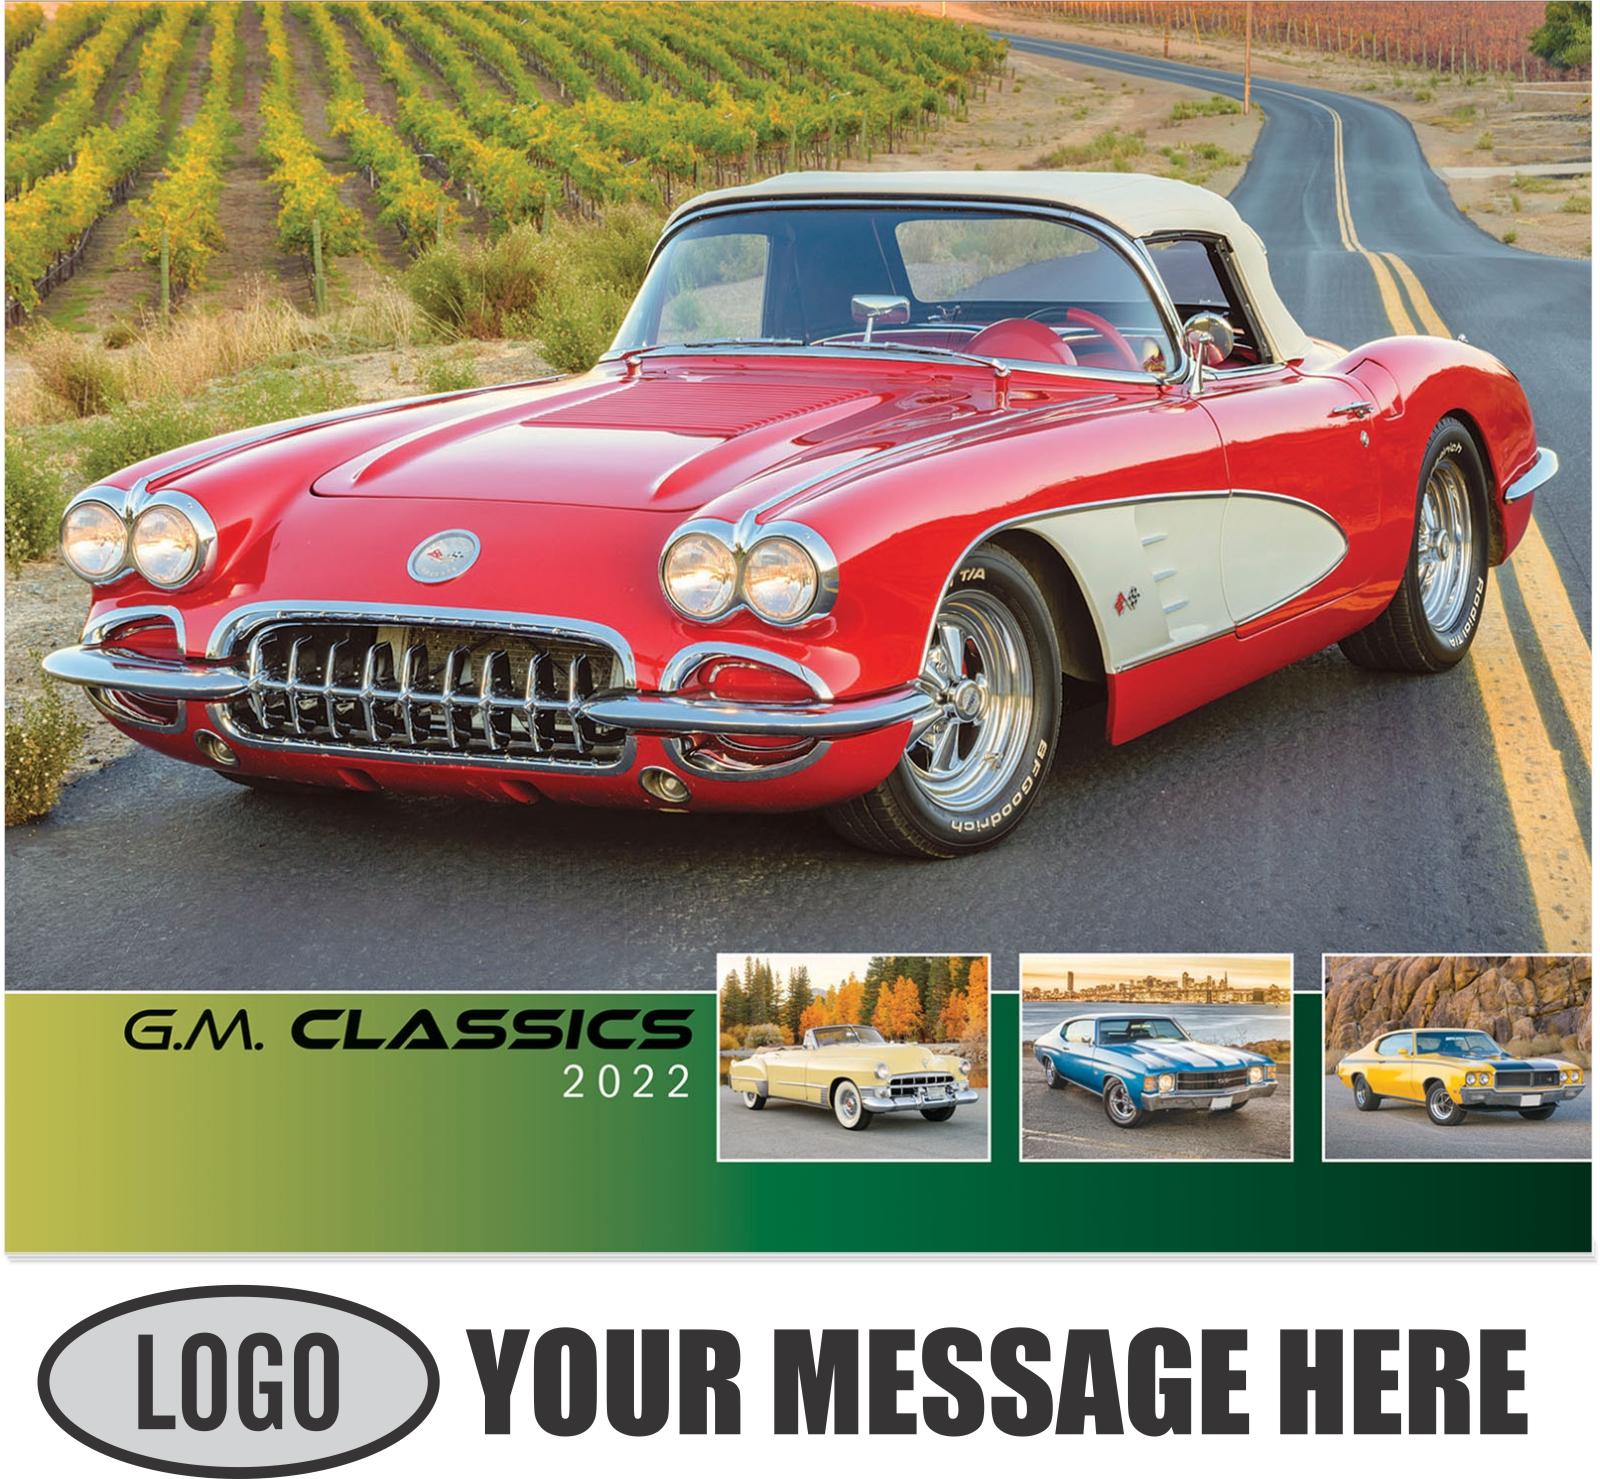 2022 GM Classics Promotional Calendar